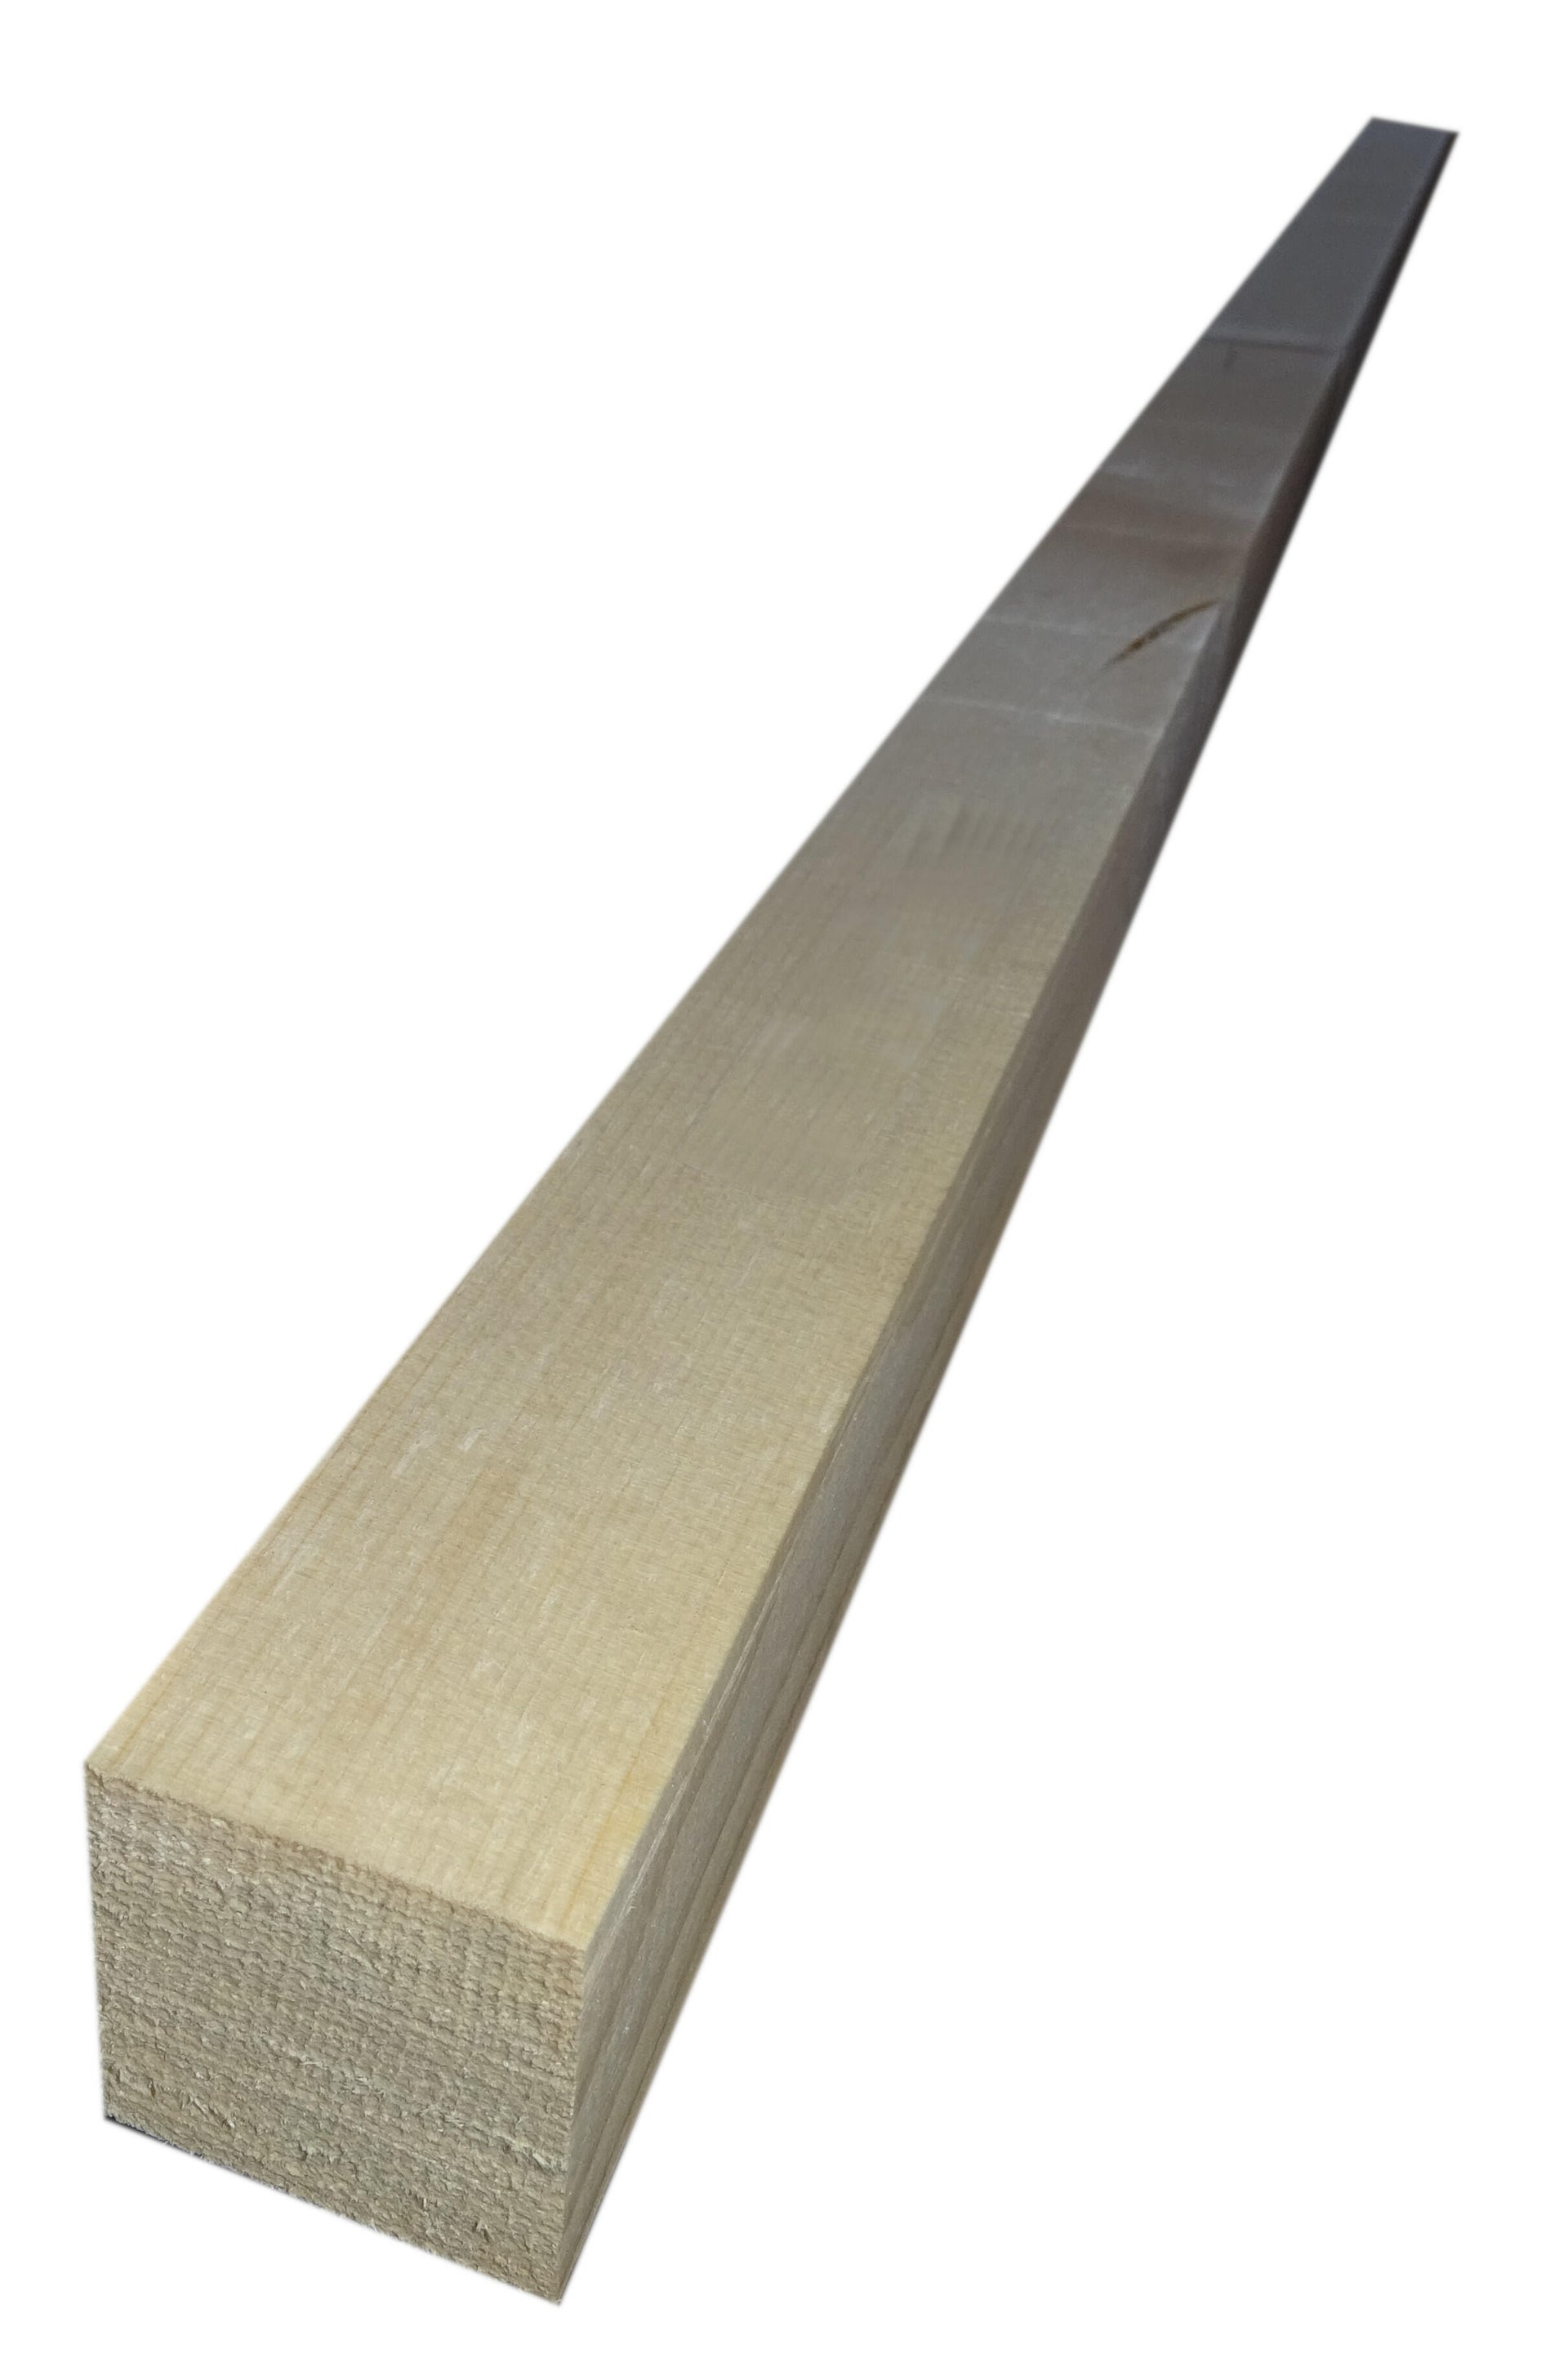 Listello piallato abete 3 m x 80 mm, Sp 80 mm